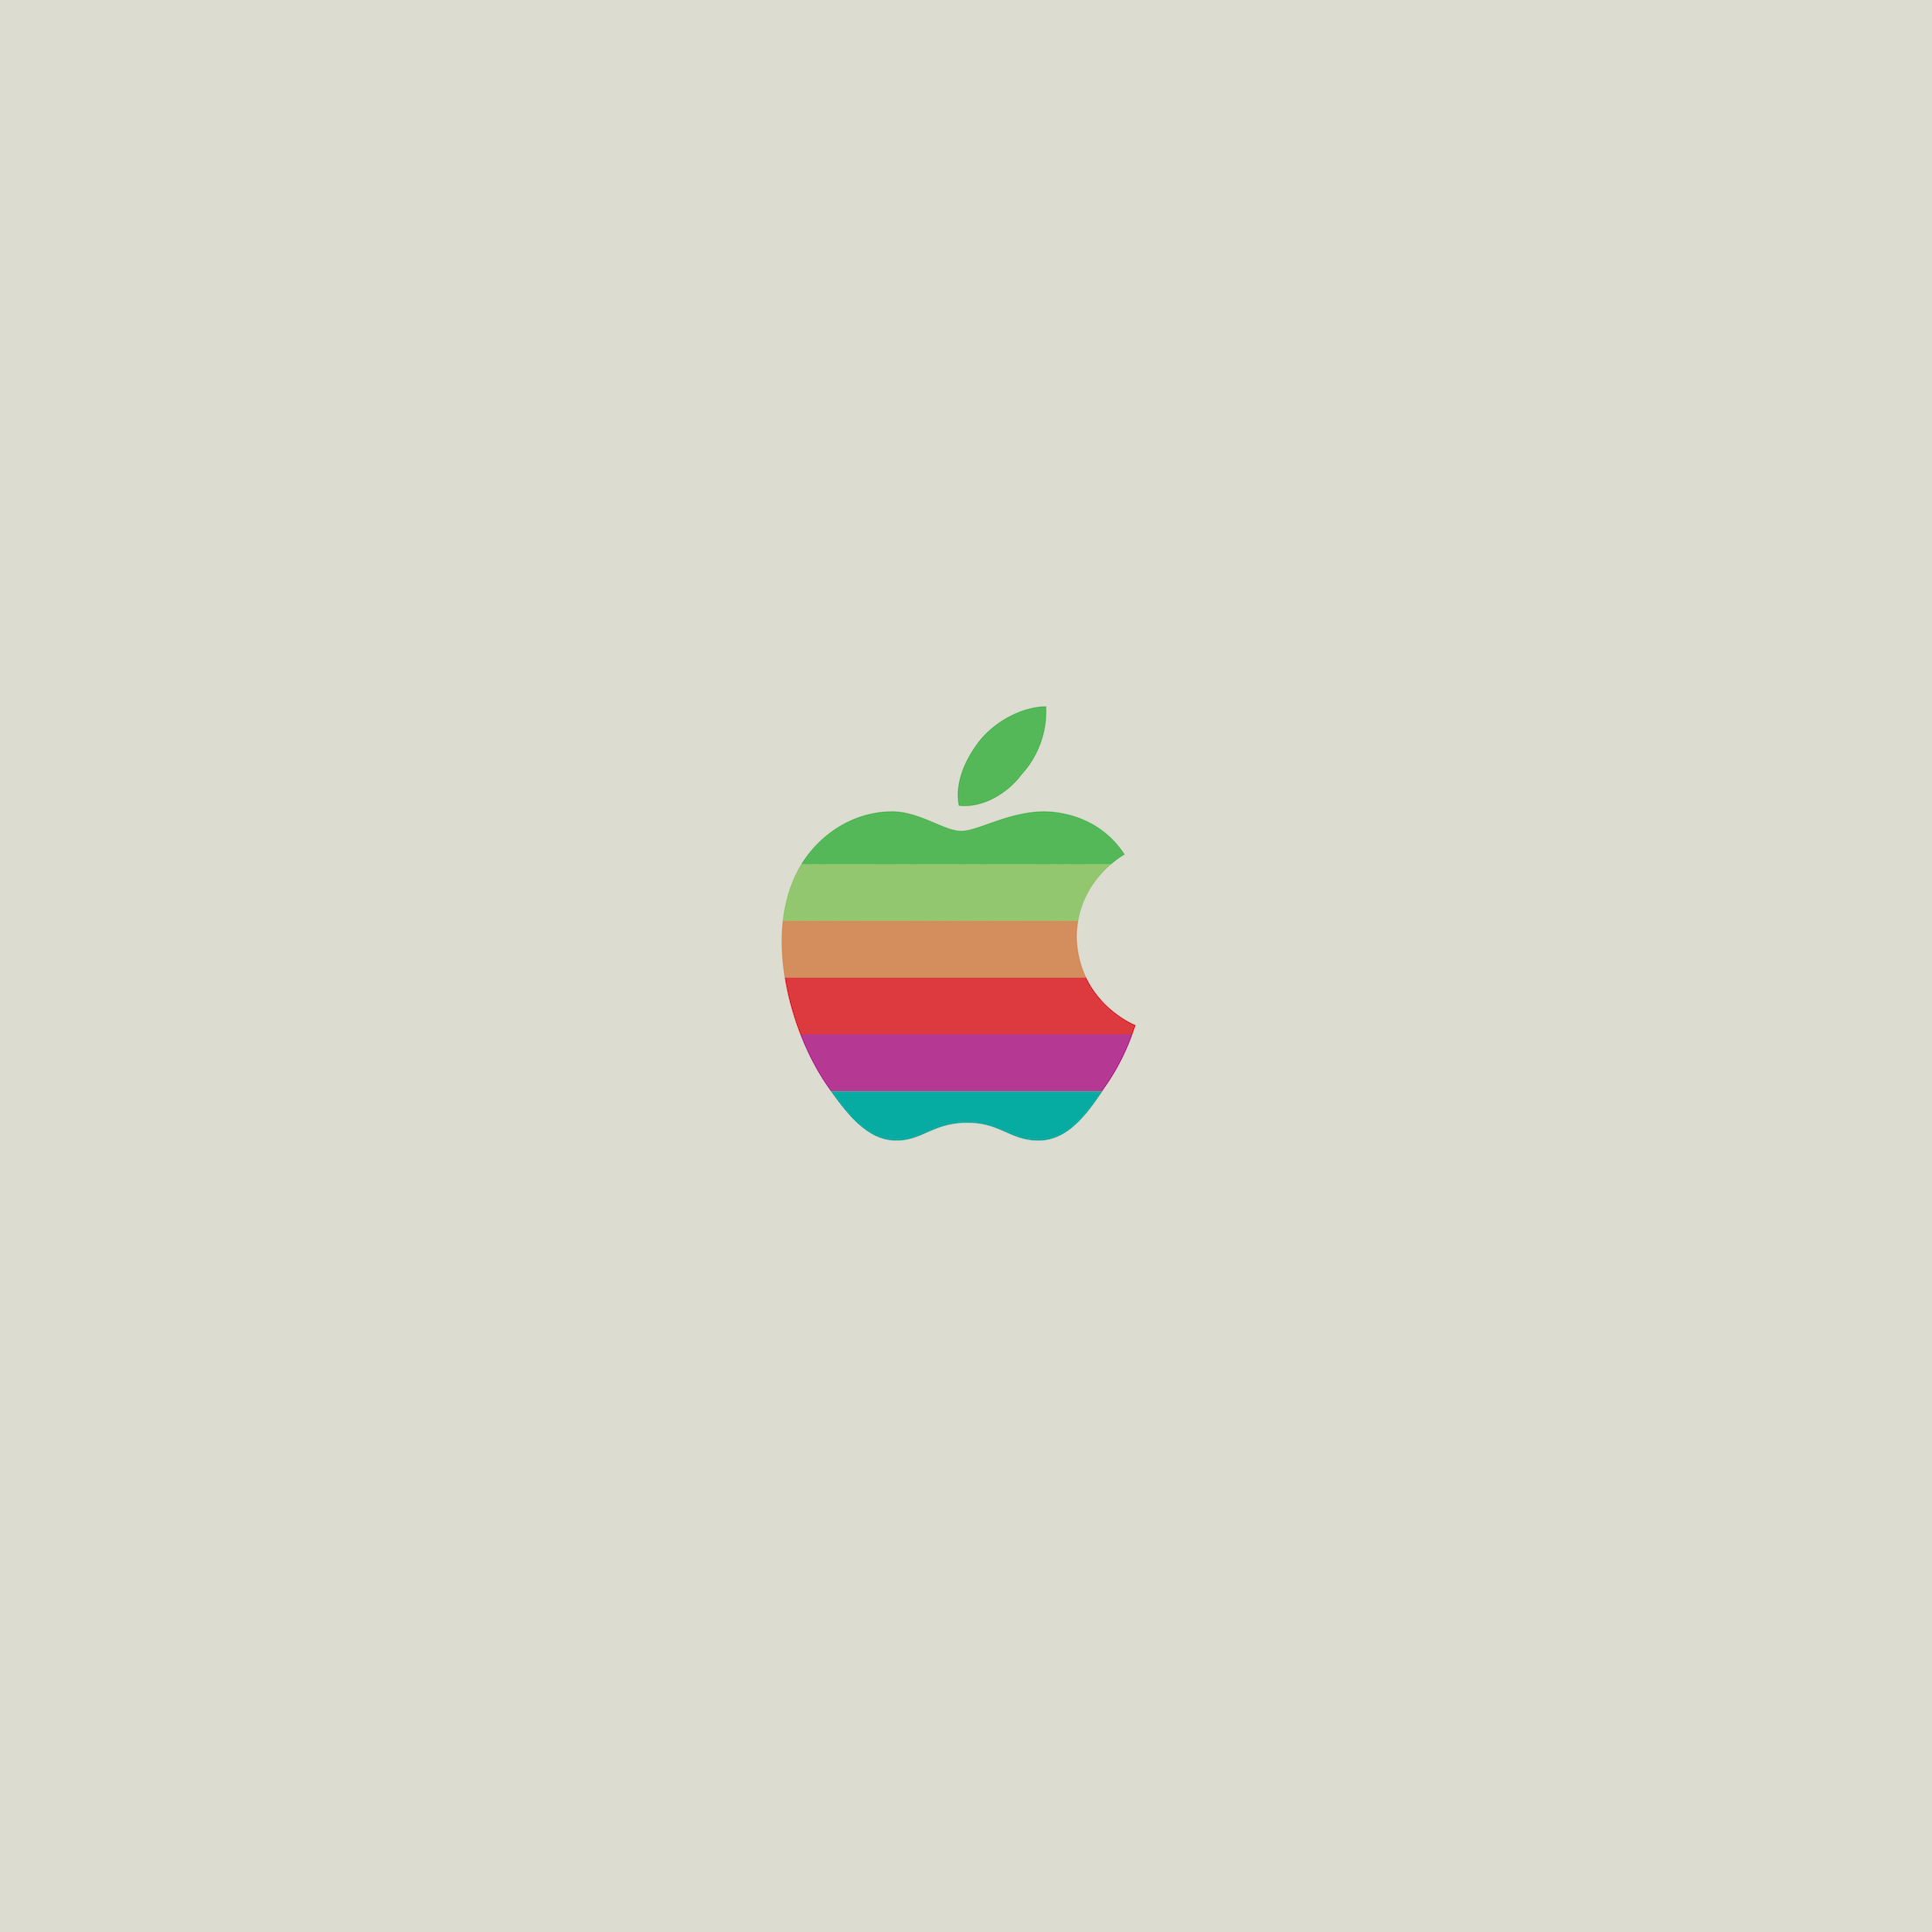 Apple 壁紙 Iphone 壁紙のコレクション